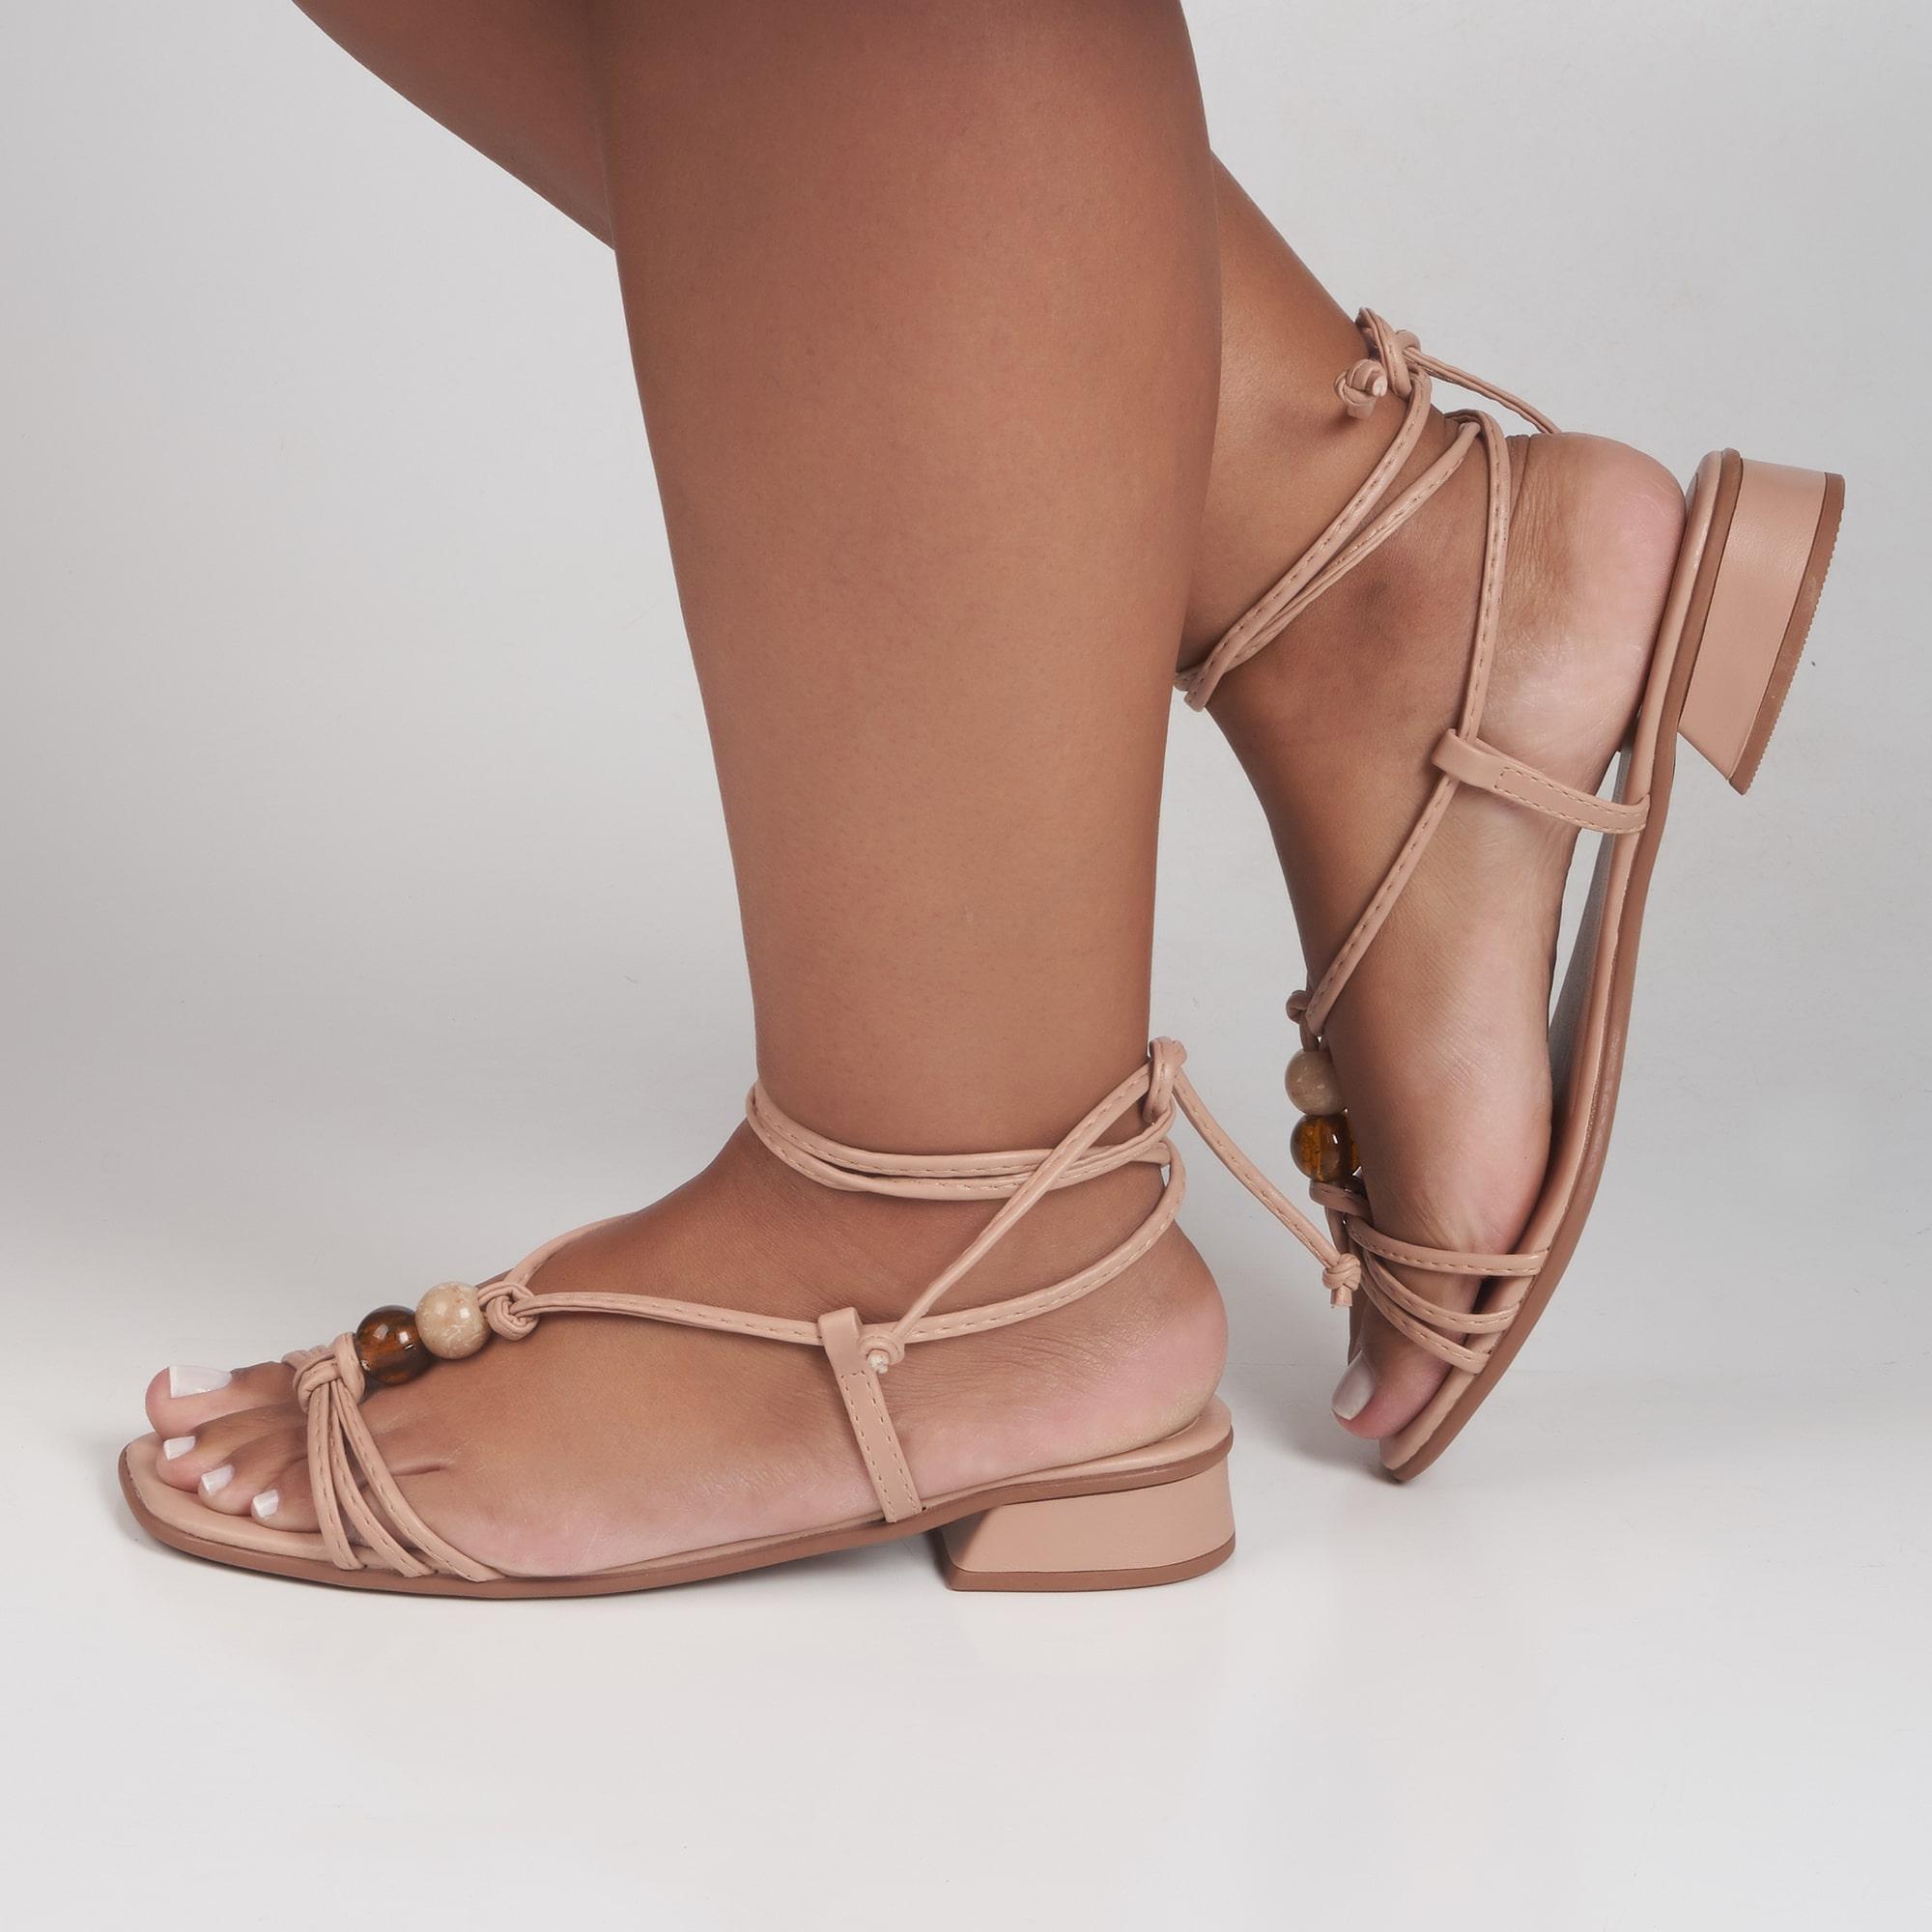 Sandália amarrar salto